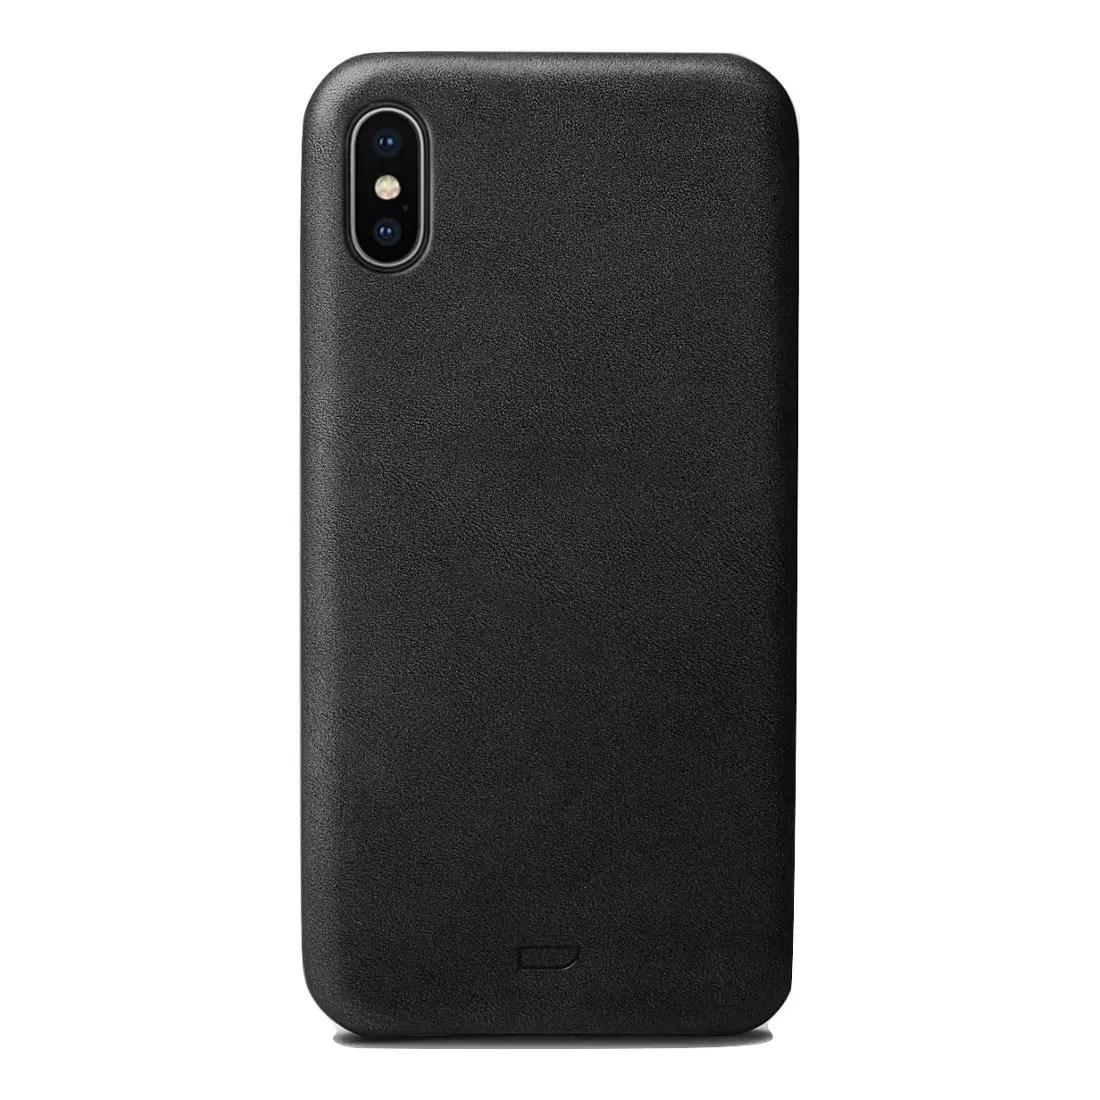 1-carl-friedrik-iphone-x-case-back-black_burned